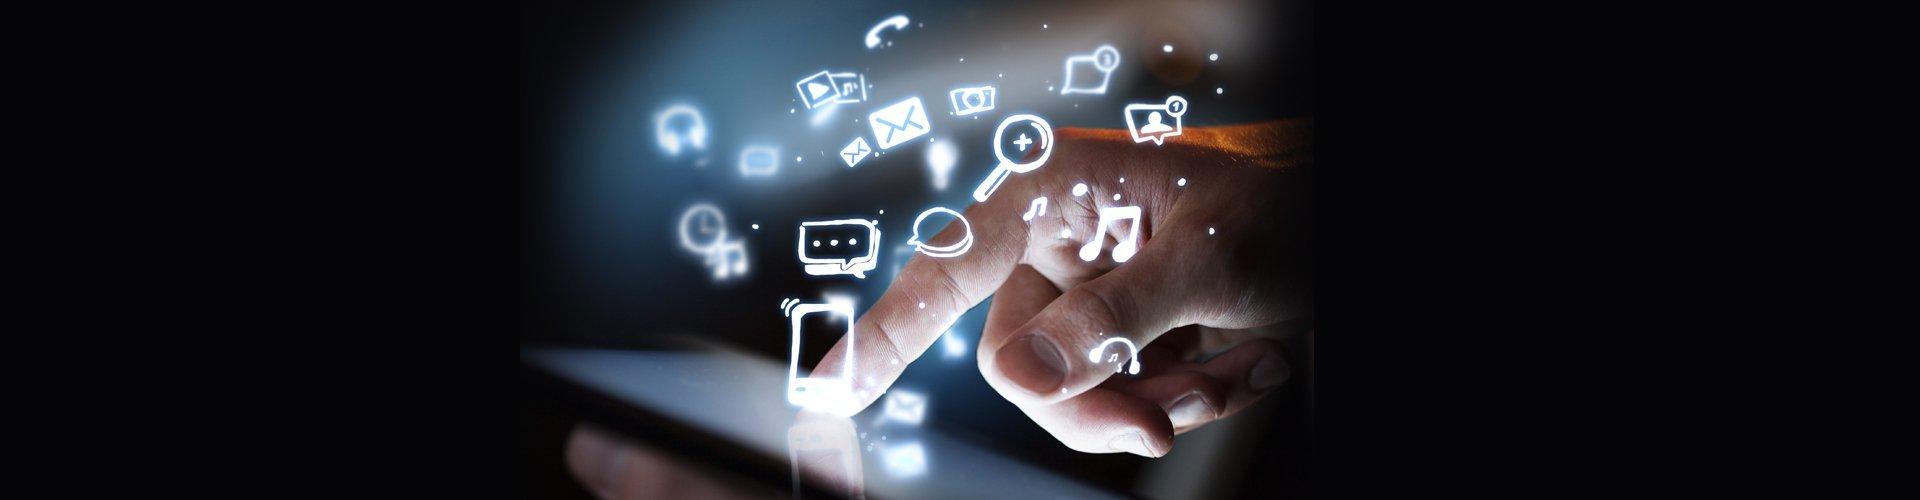 cloud ready digital solutions